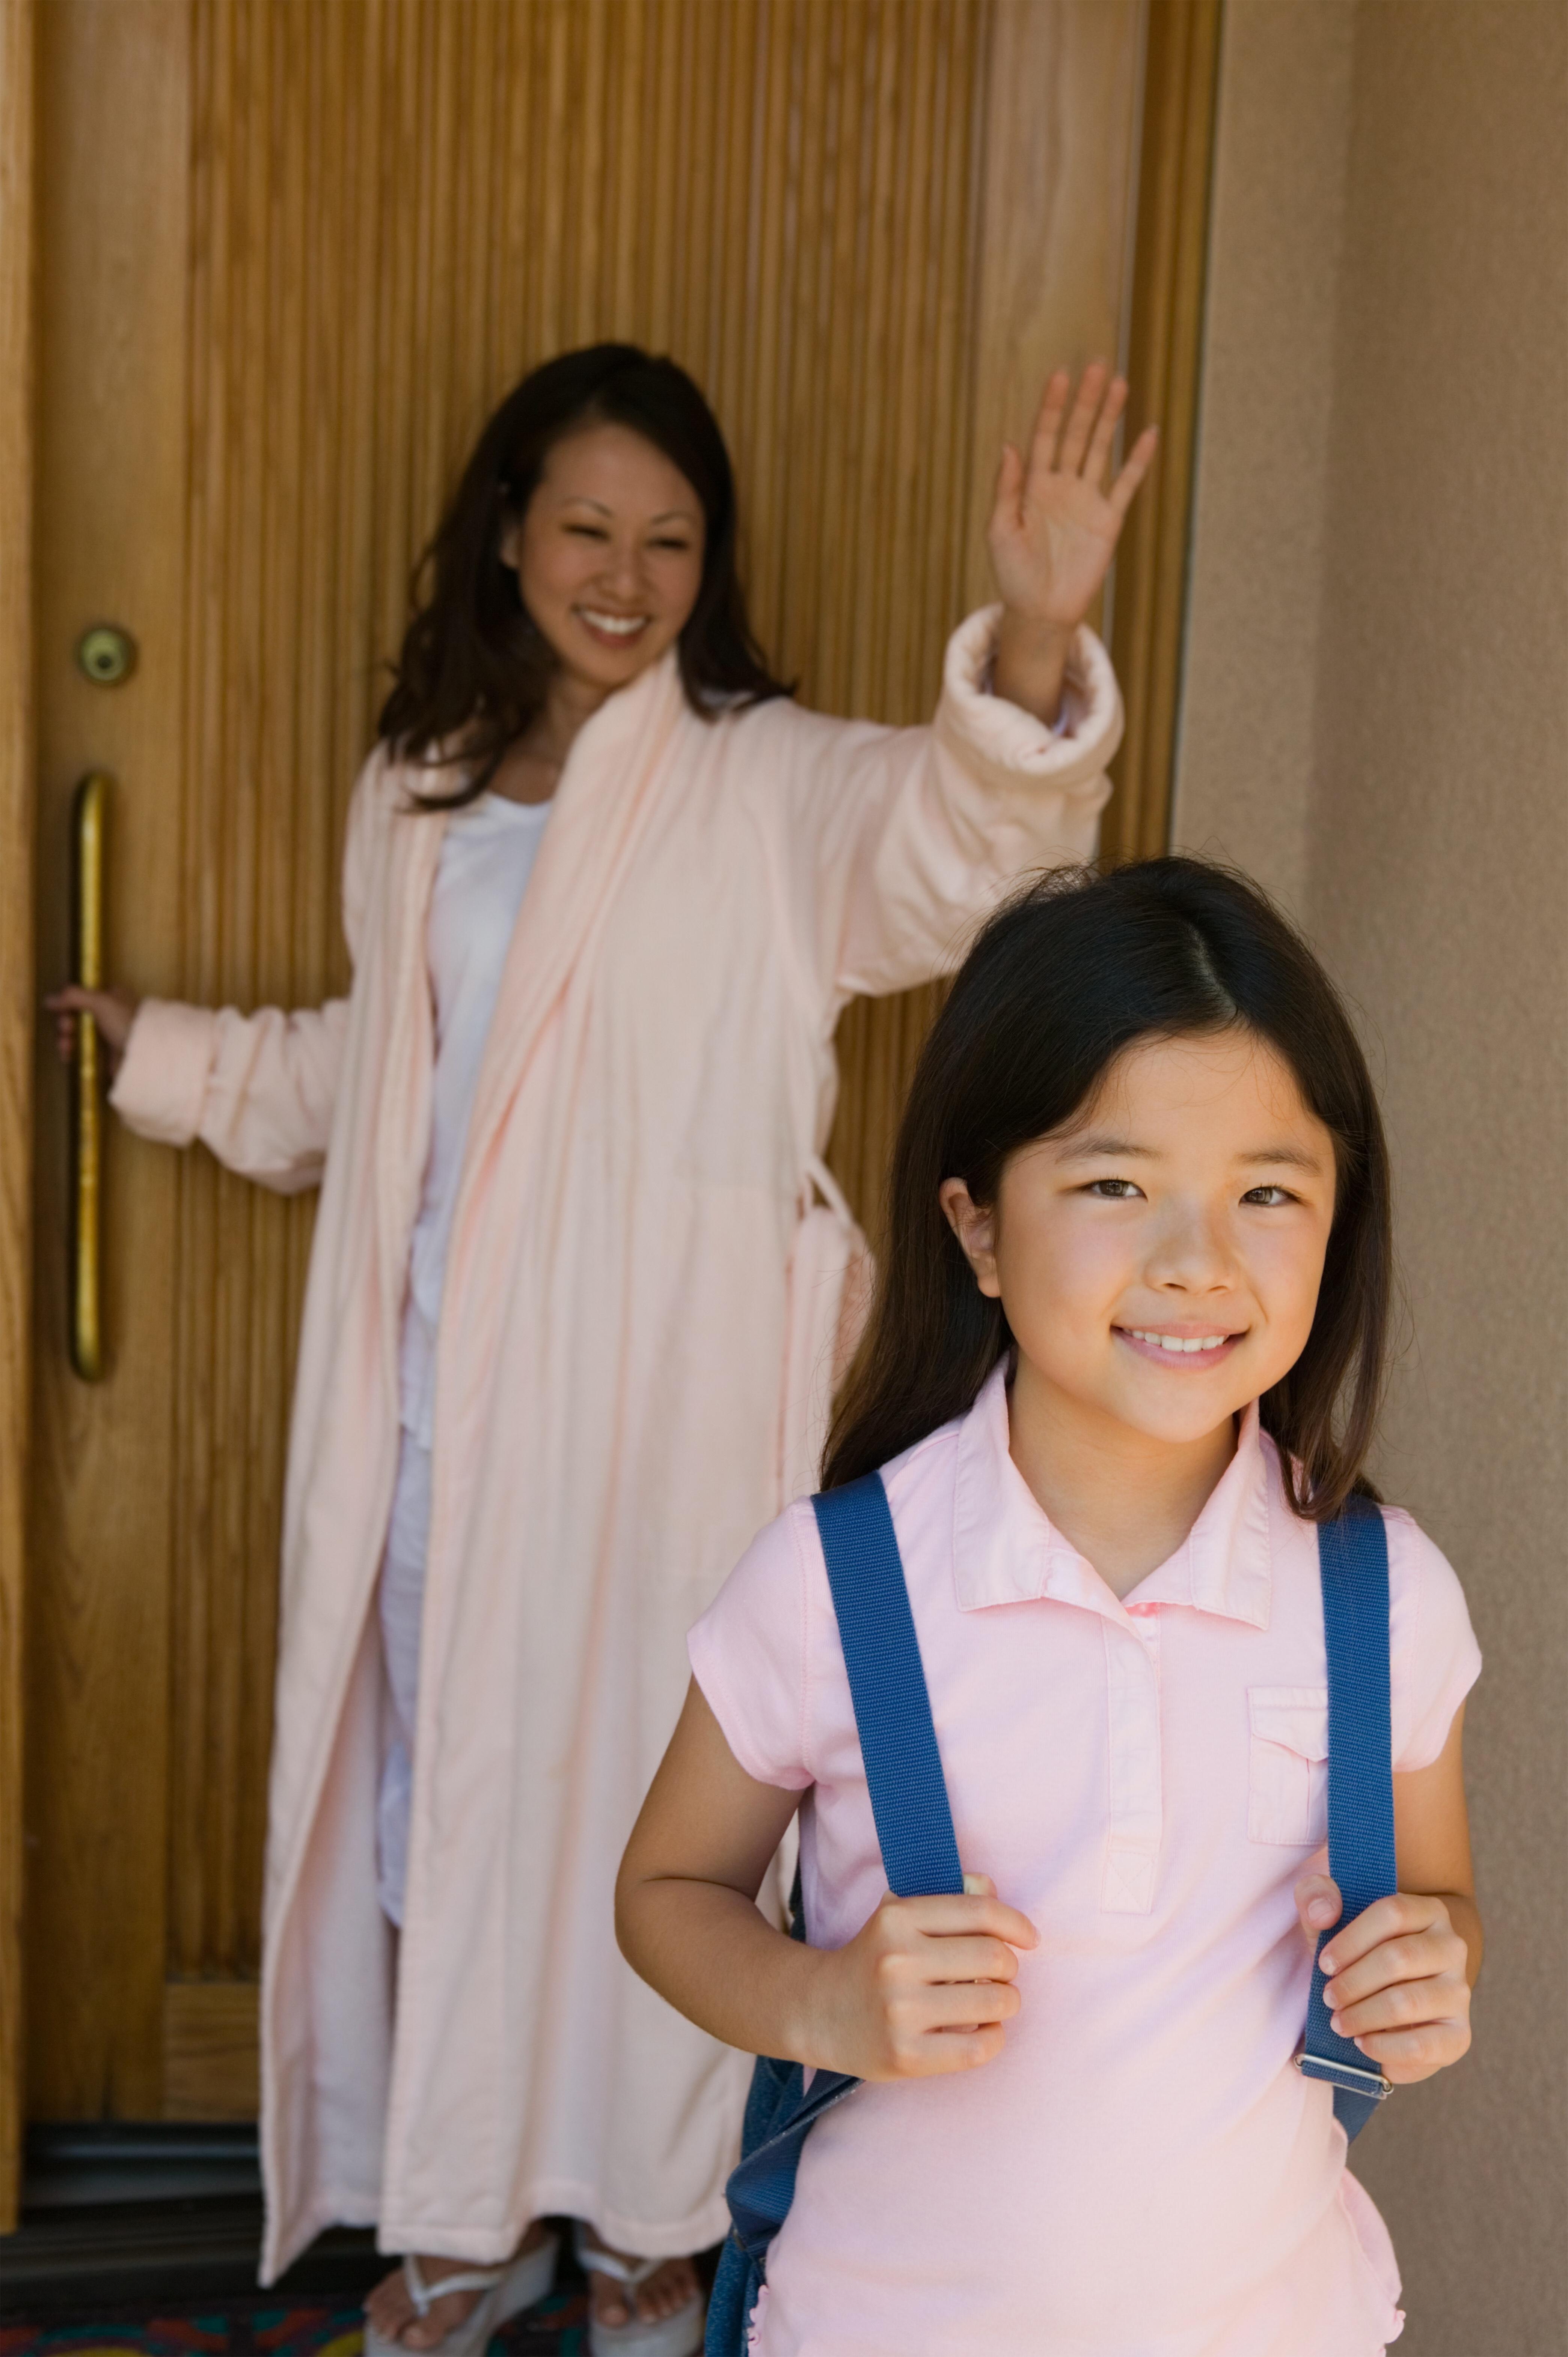 Mother waving daughter off to school